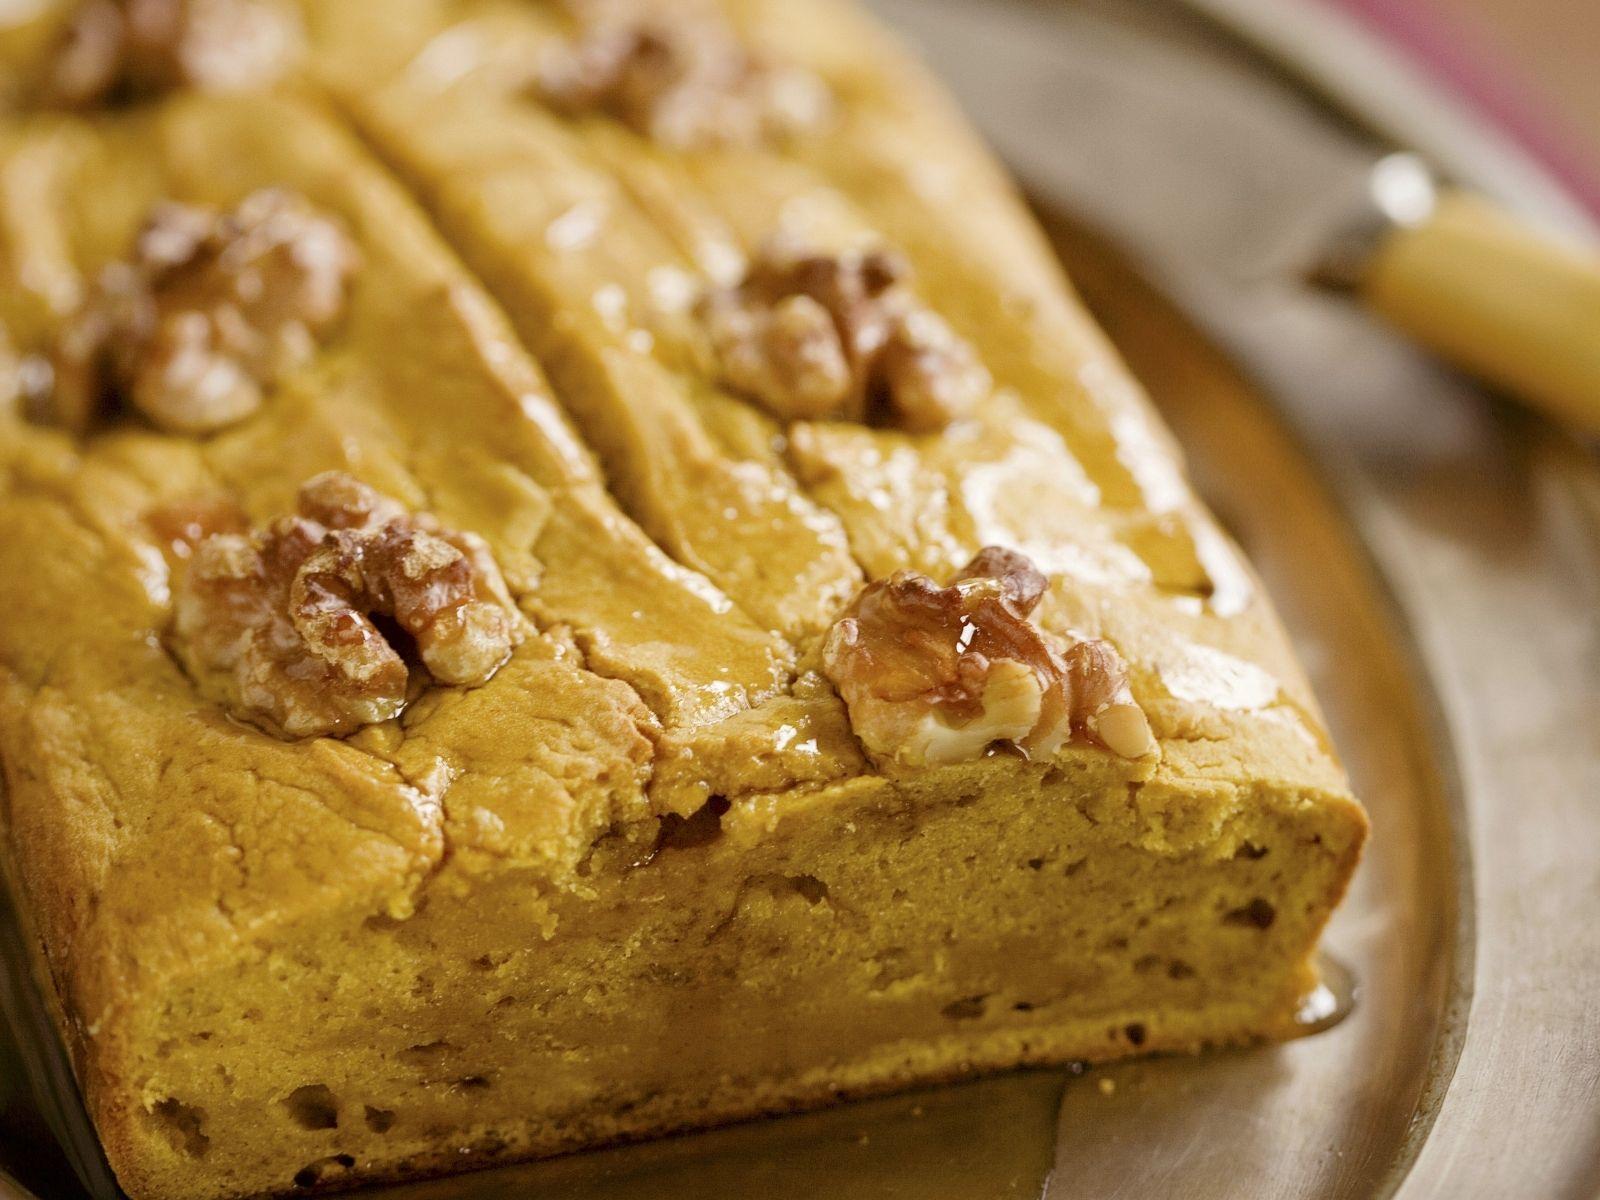 Kurbis Walnuss Brot Rezept Eat Smarter